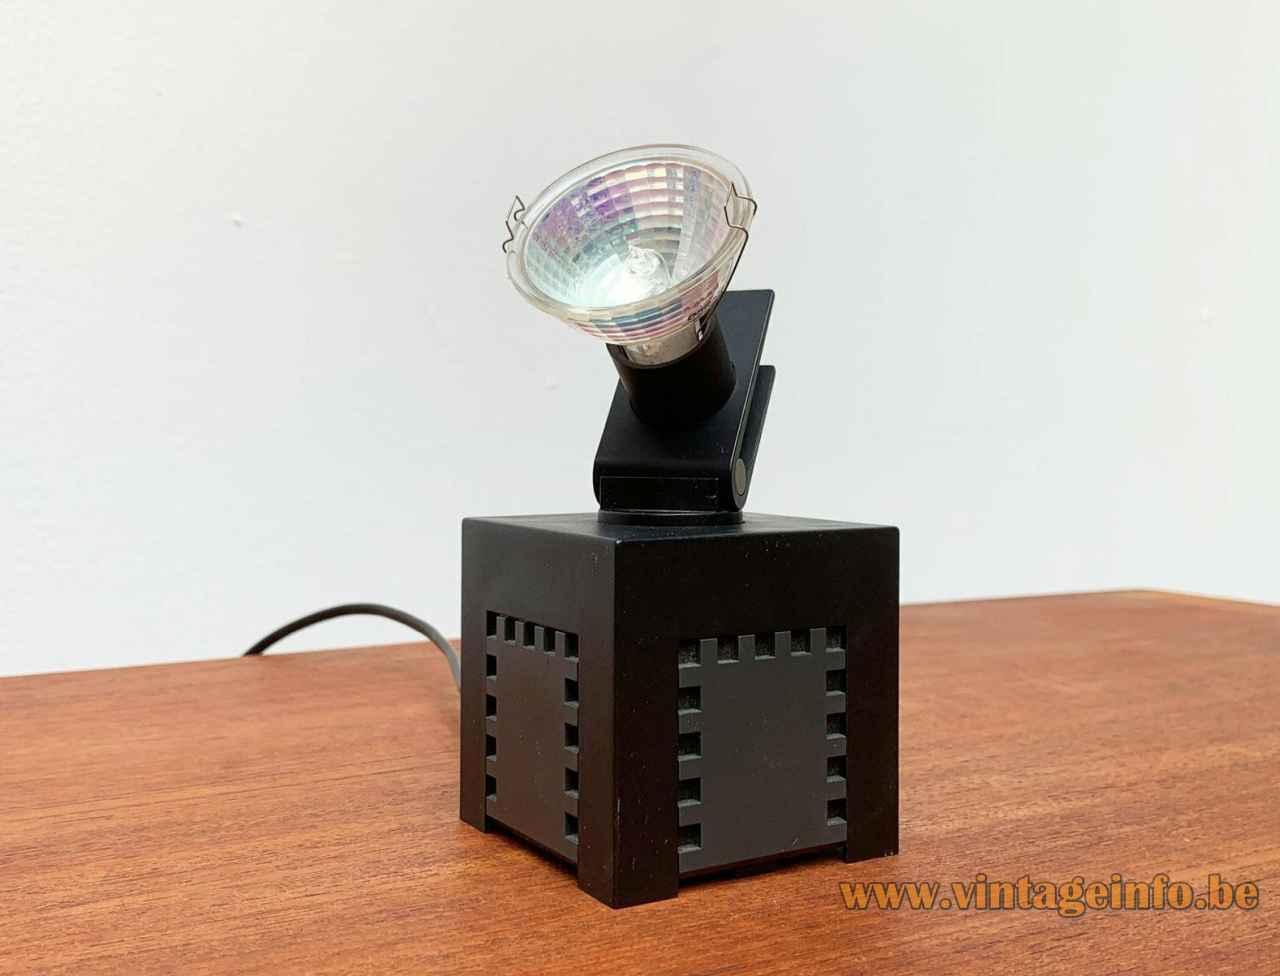 Osram 42311 cube spotlight square black plastic base adjustable halogen dichroic lampshade 1970s Germany